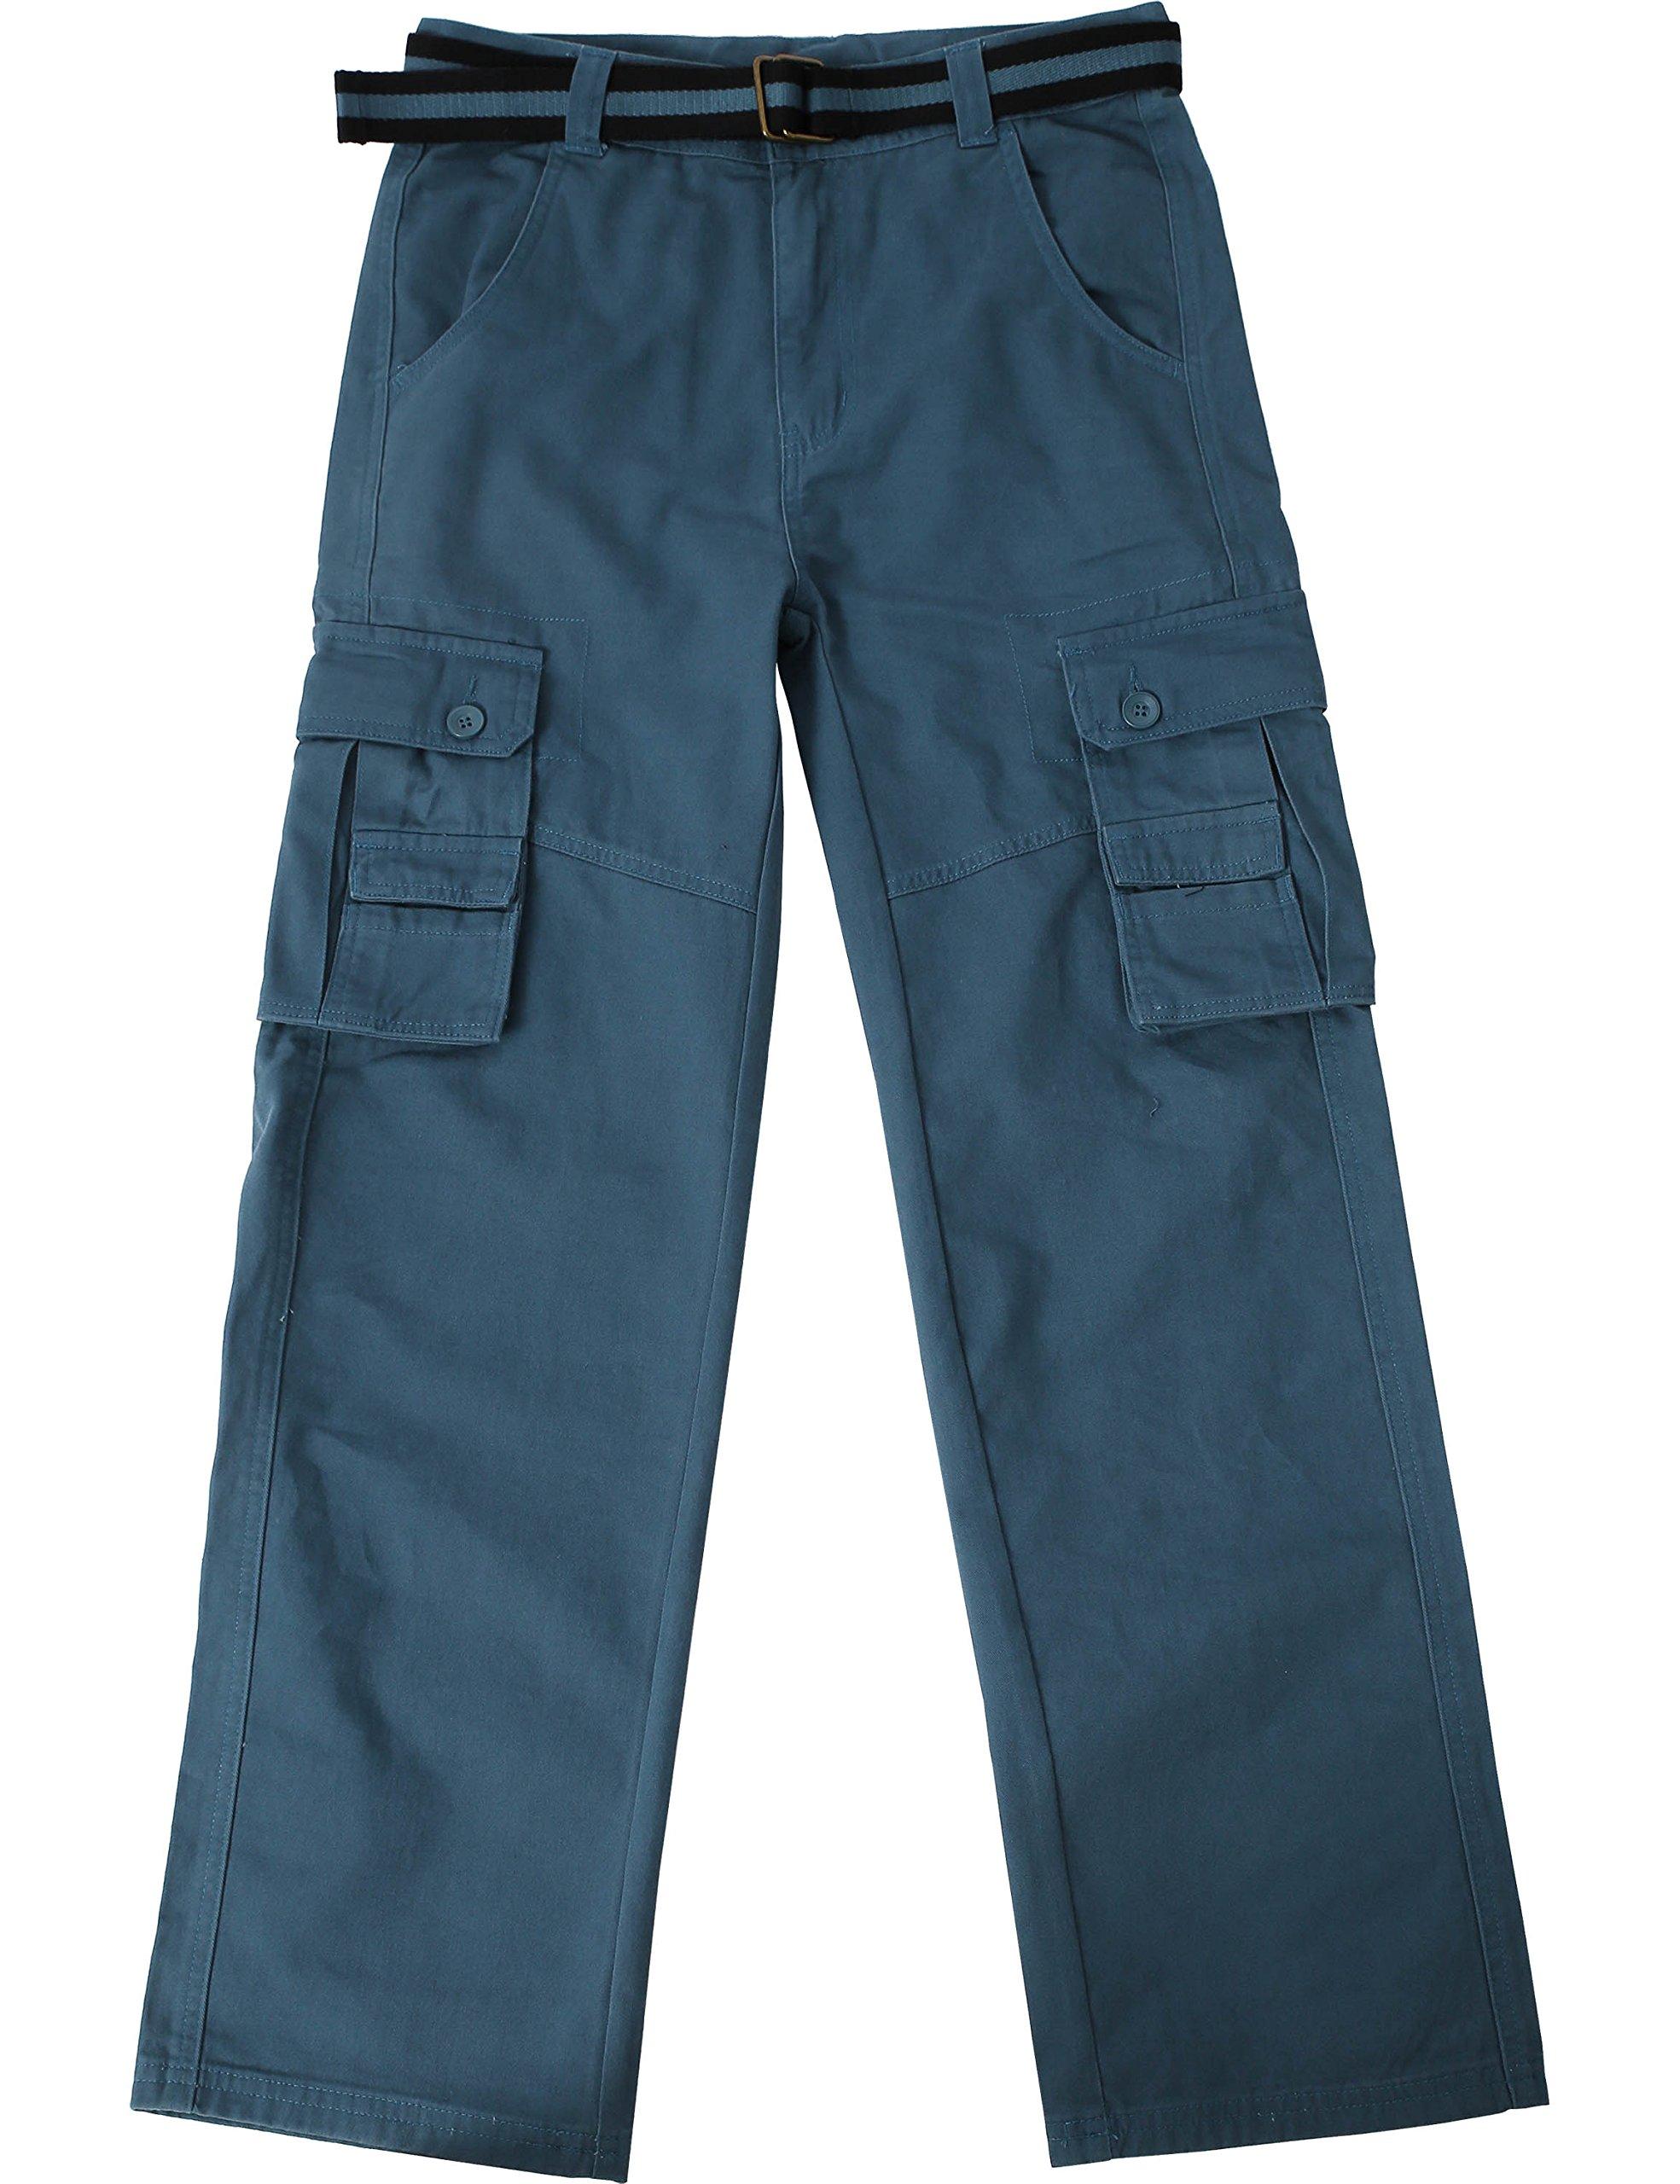 Ma Croix JP Mens Cargo Pants with Utility Belt (40/ pj01_dkblue) by Ma Croix (Image #1)